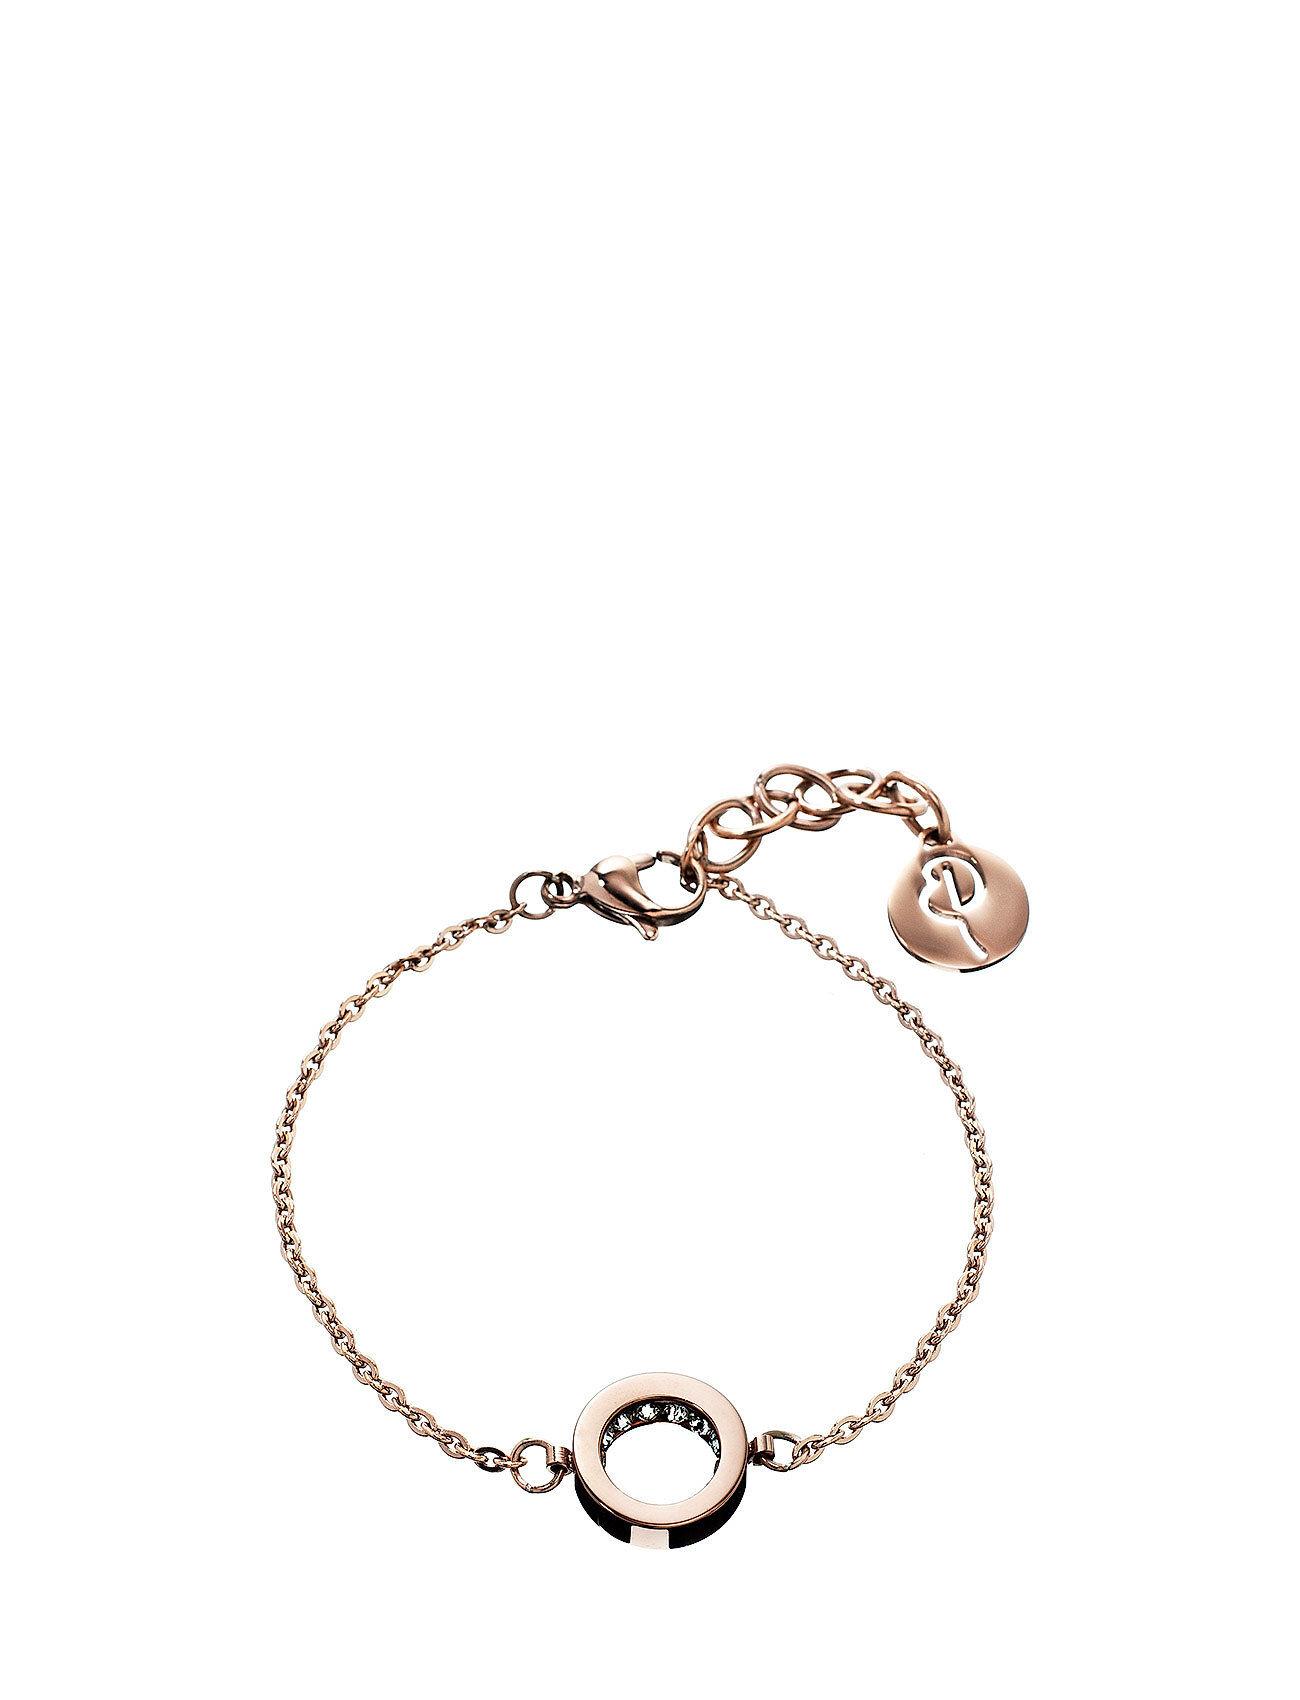 Edblad Monaco Bracelet Thin Accessories Jewellery Bracelets Chain Bracelets Kulta Edblad